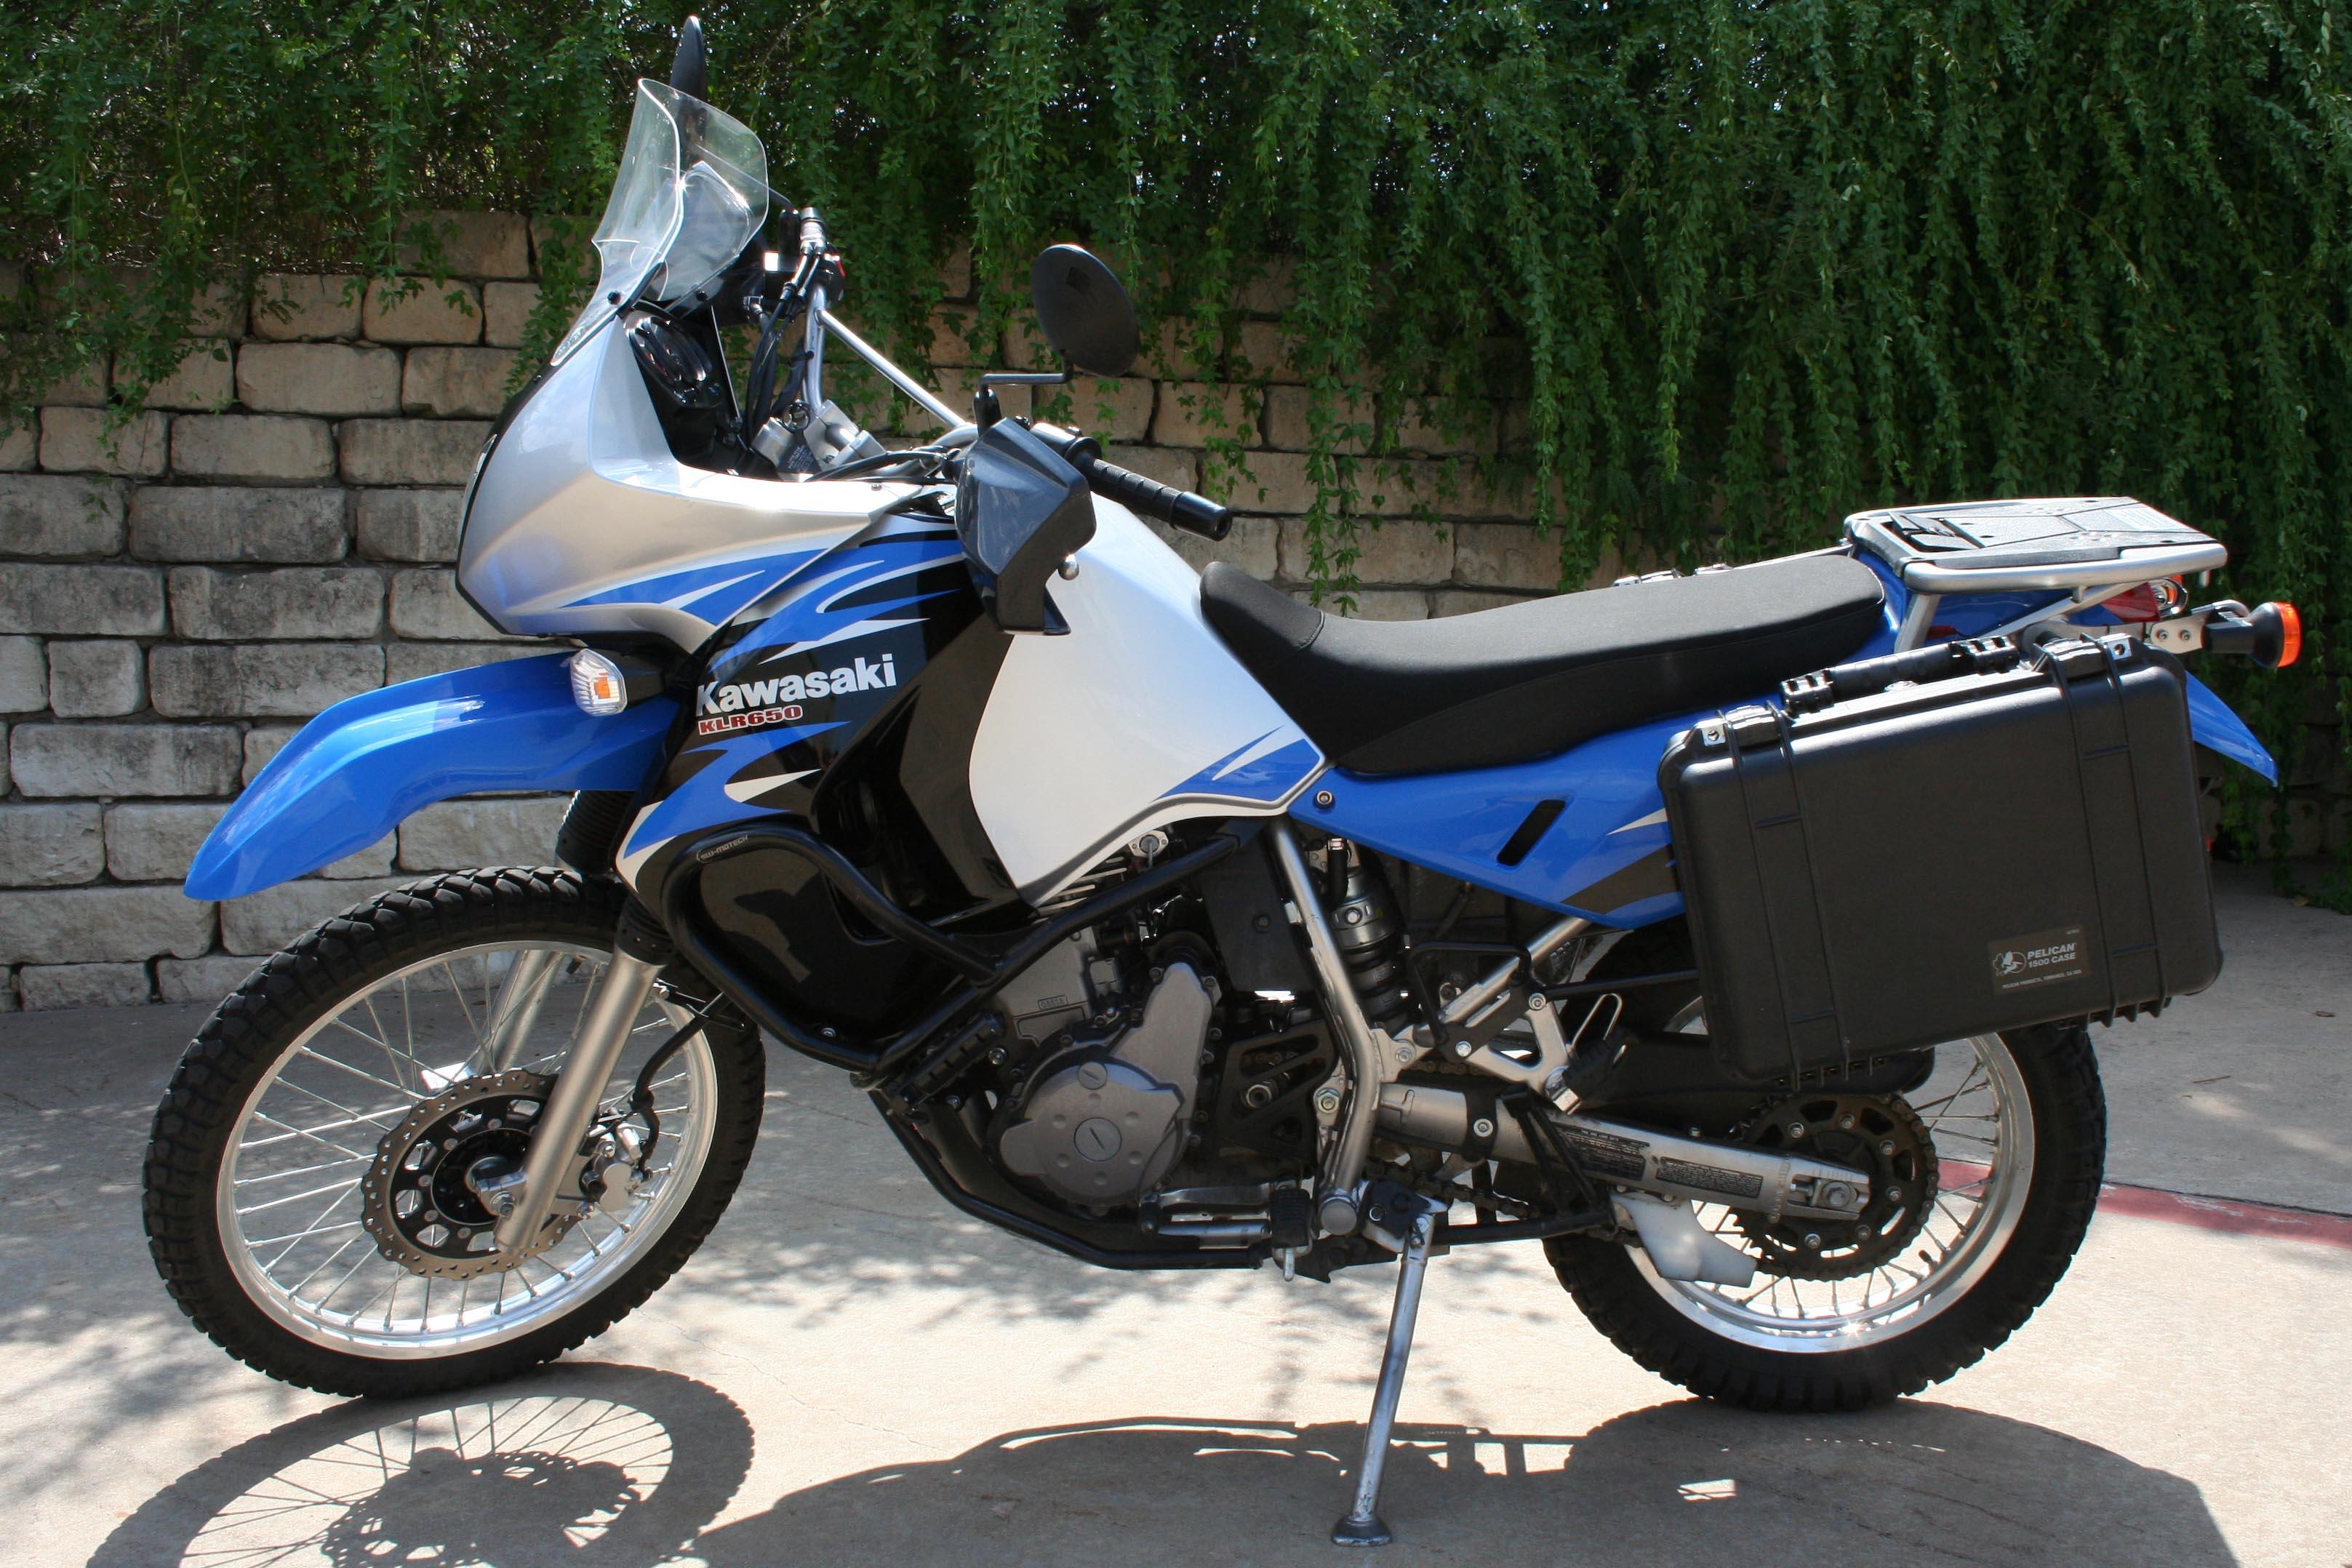 2008 Kawasaki Klr 650 S Dual Sport Sold Covex Cycles